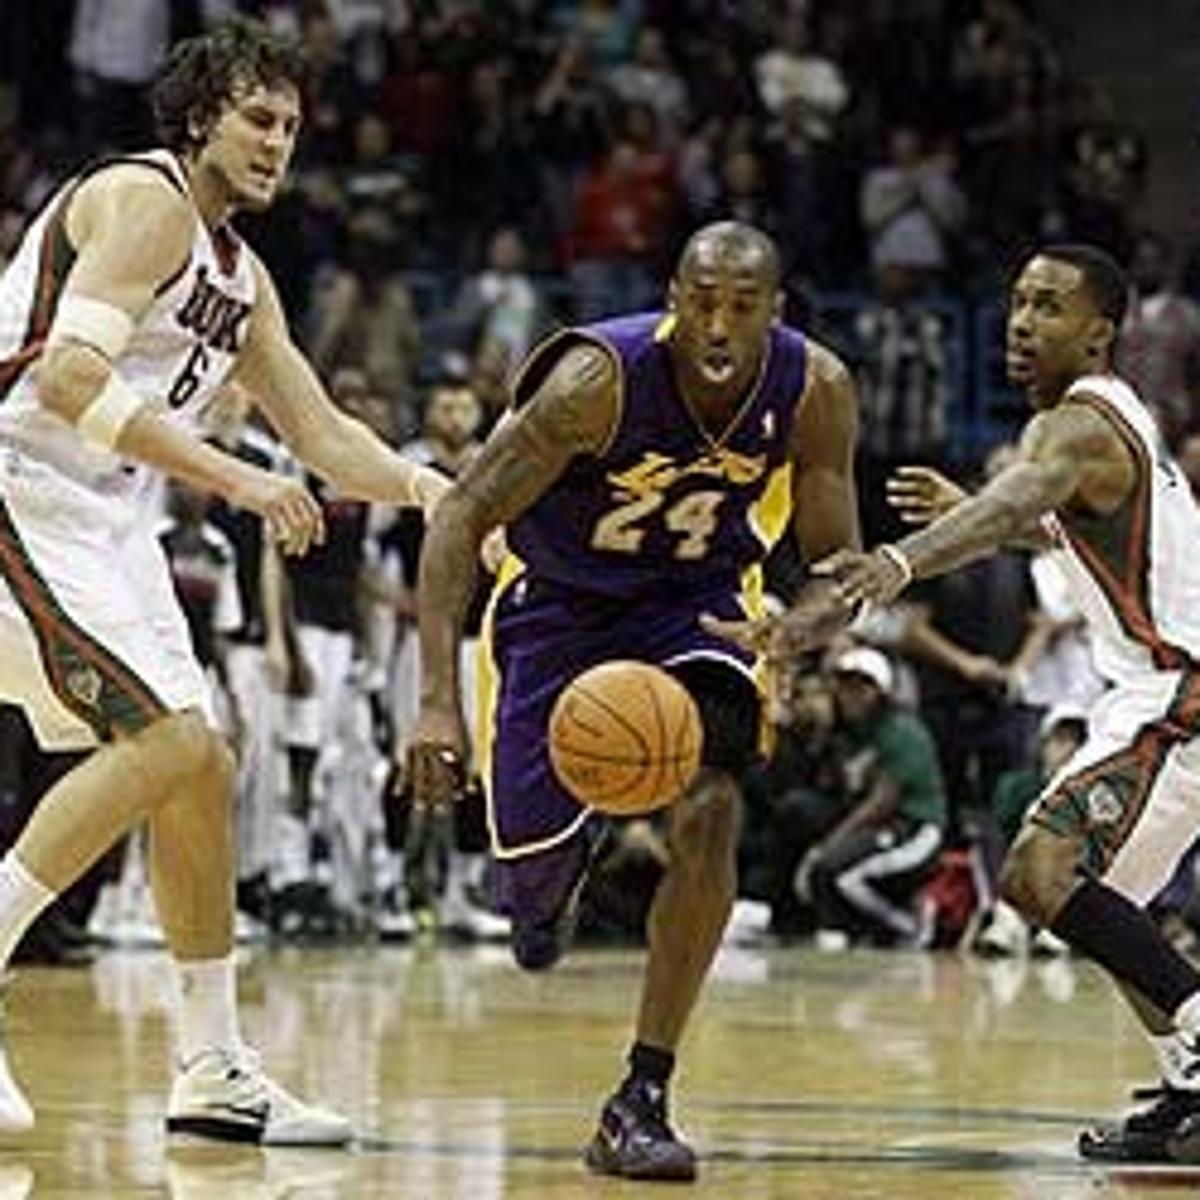 c346c3f882e NBA  Bryant sparks Lakers to beat Bucks